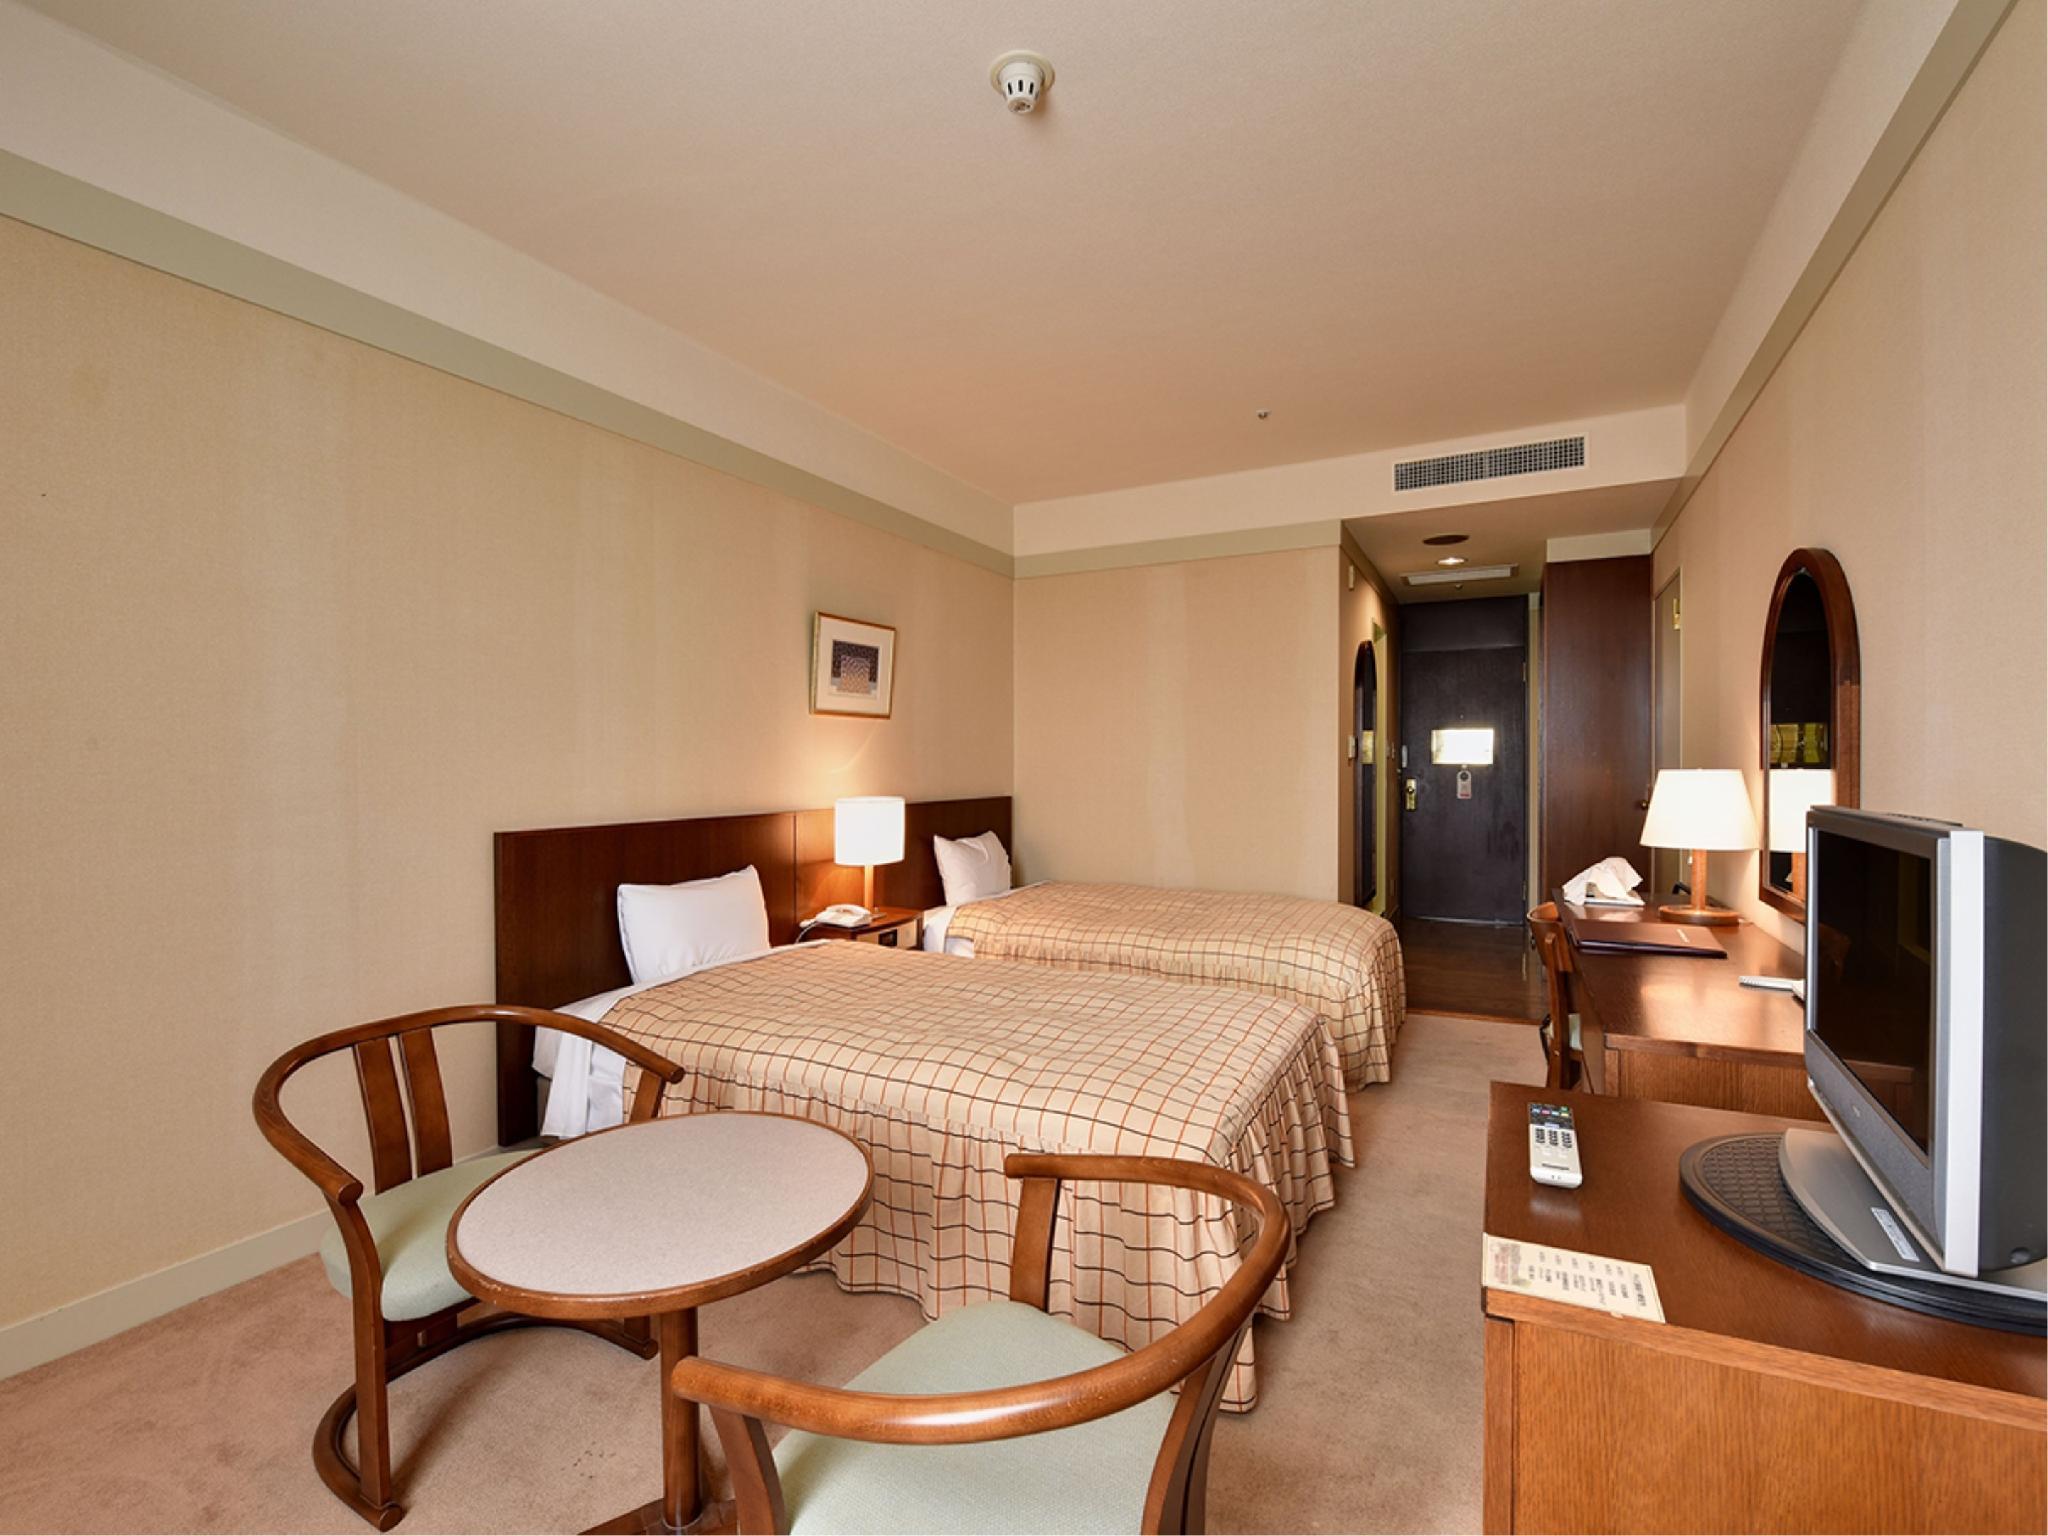 Yugashima Golf Club Hotel Toen Izu Japanican Com